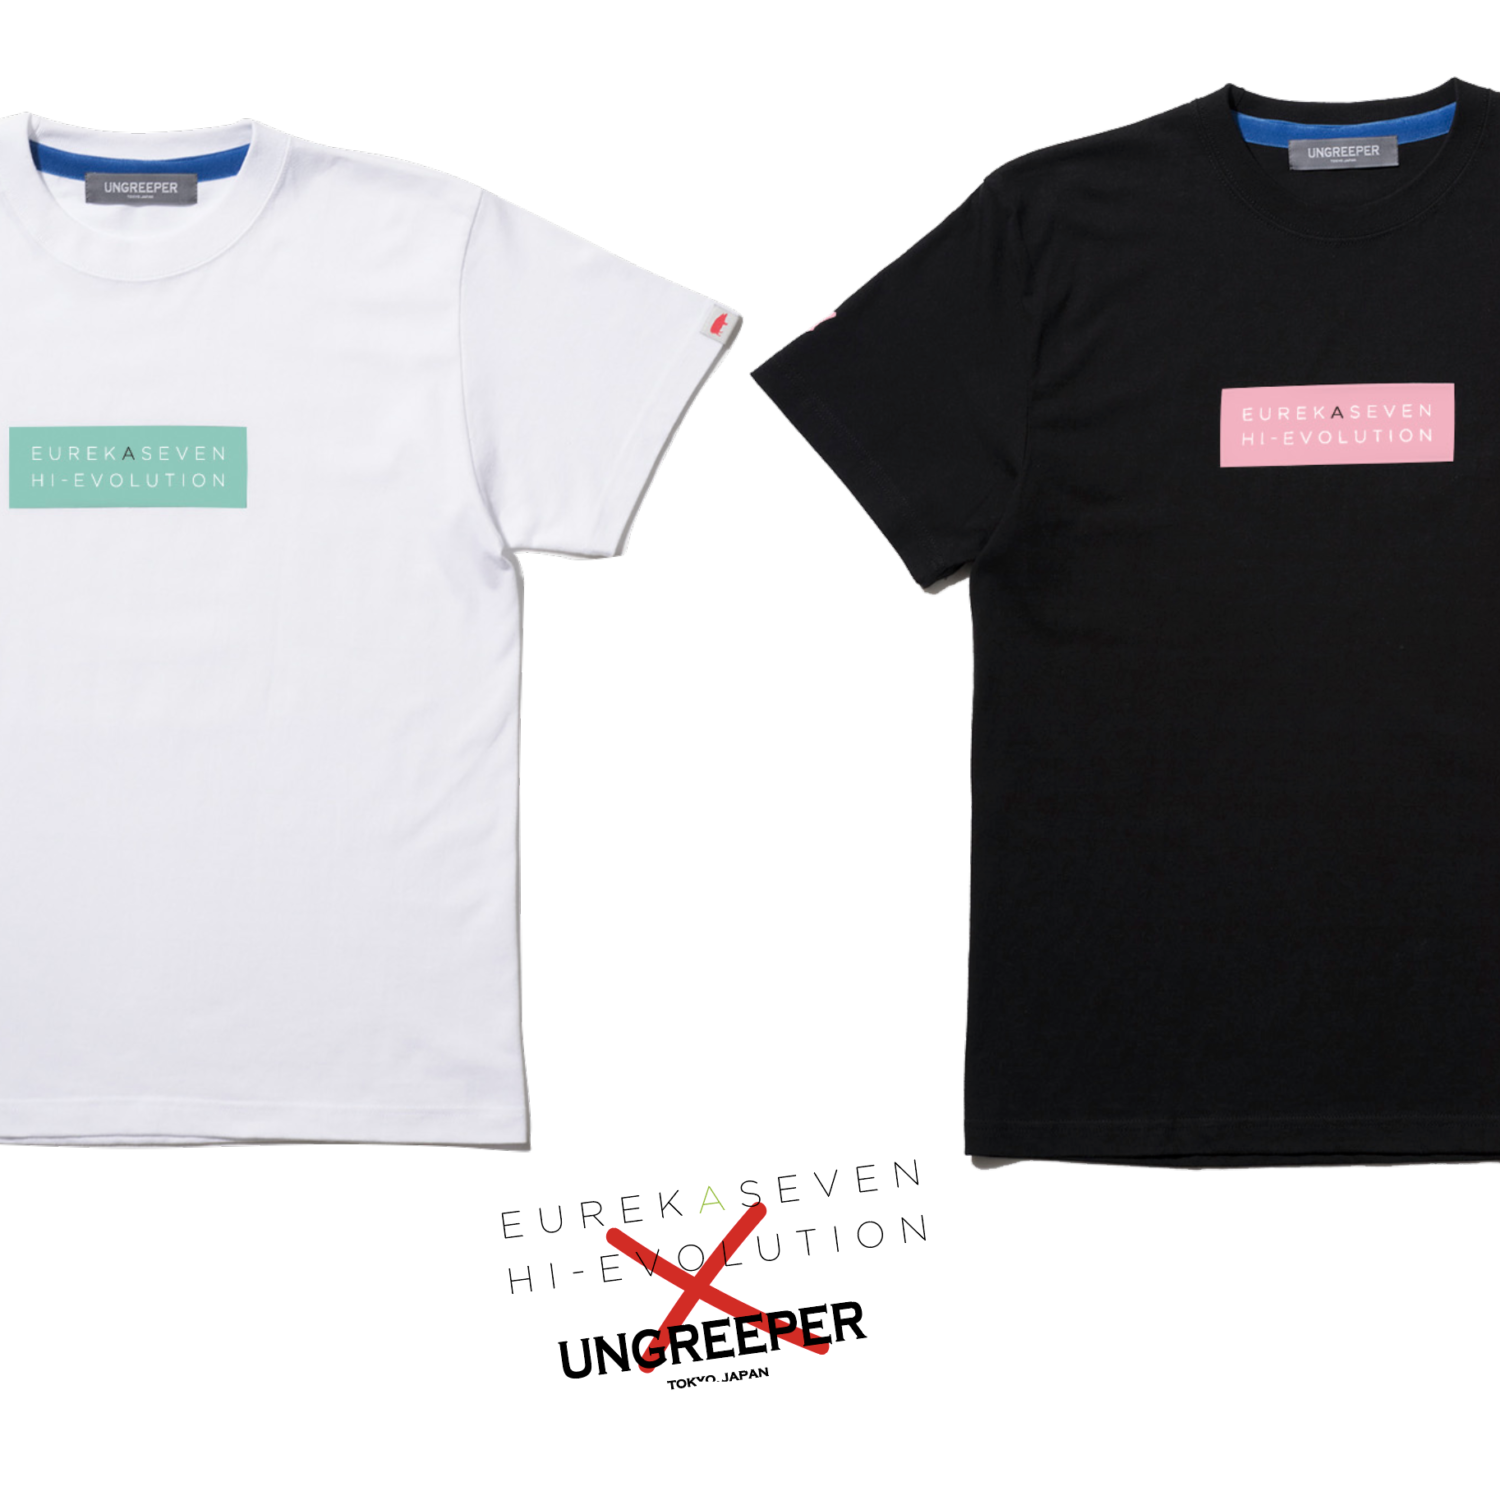 UNGREEPERコラボレーションTシャツ(エウレカ&アネモネ)